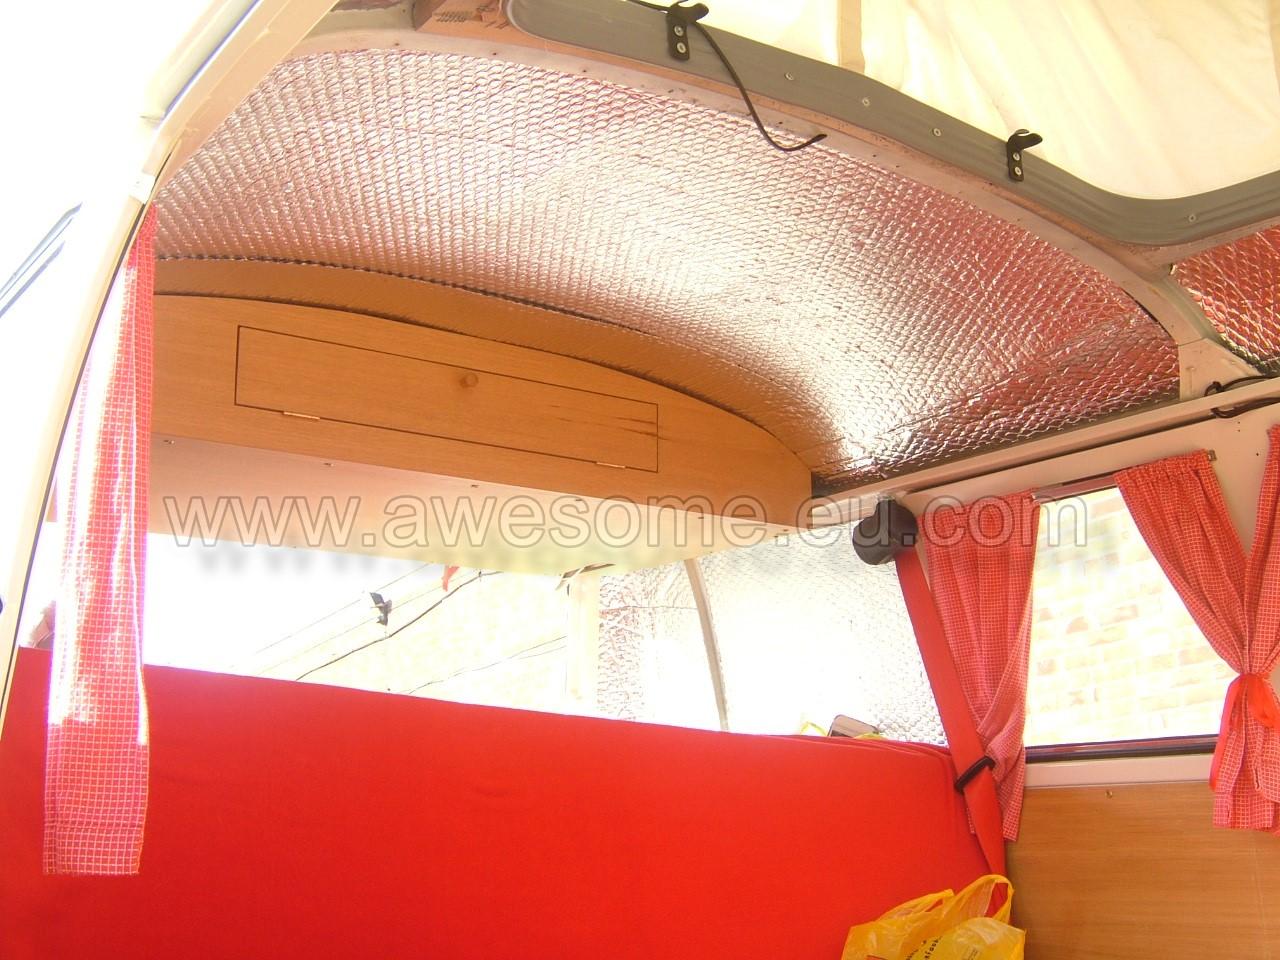 Splits screen campervan interior